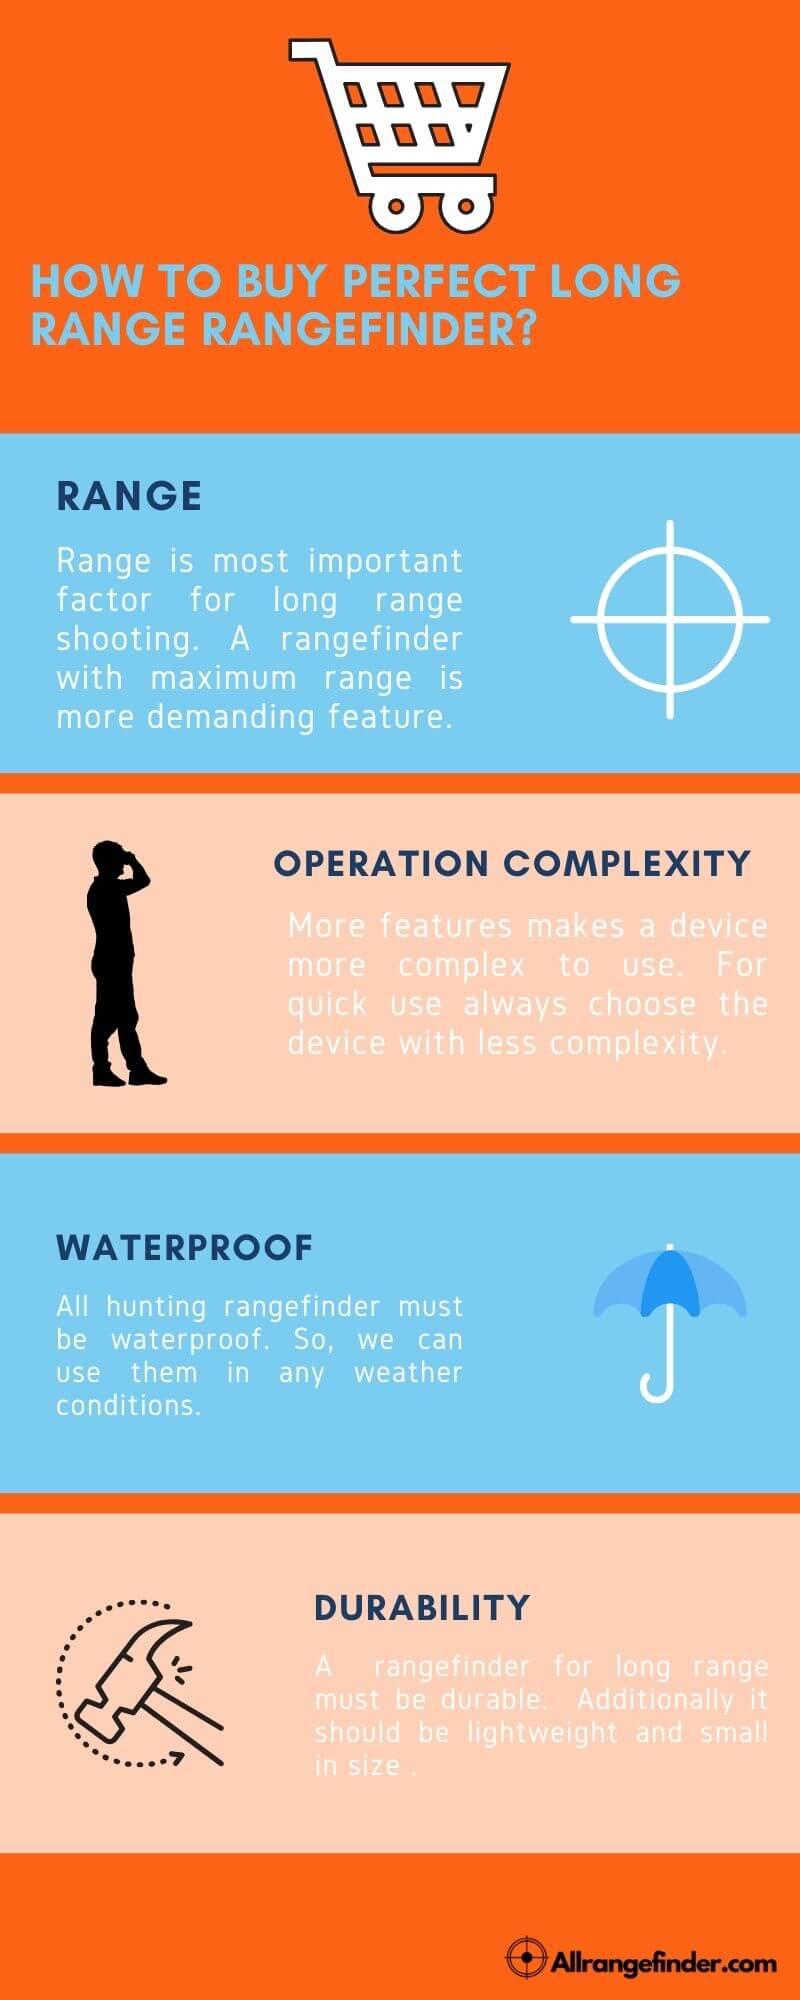 How to buy best long range rangefinder